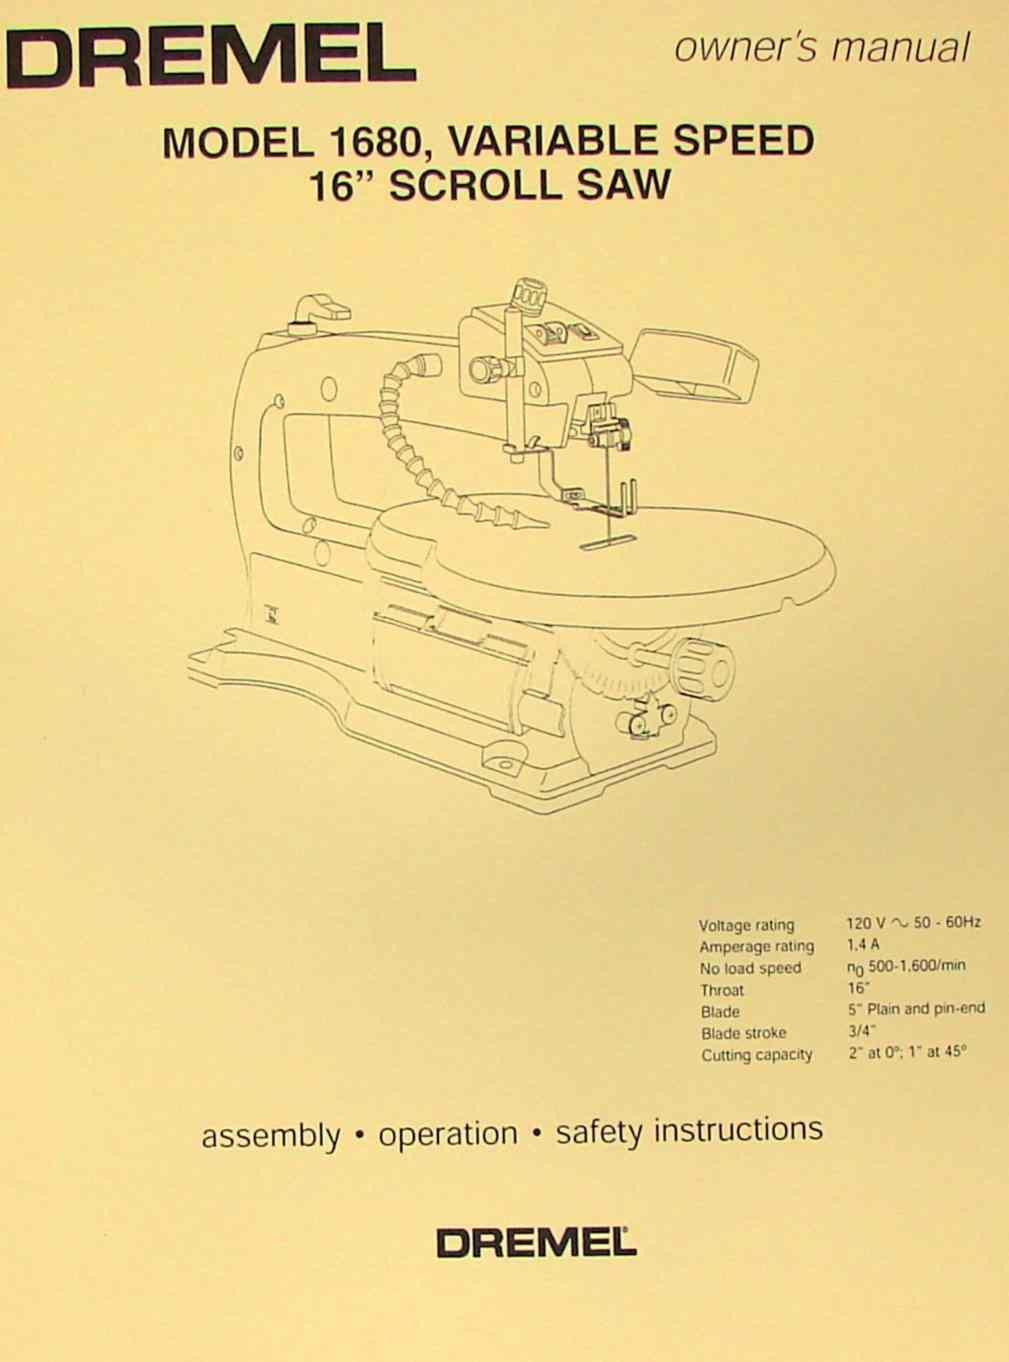 Dremel 1680 Wiring Diagram Electrical Diagrams Scroll Saw Manual